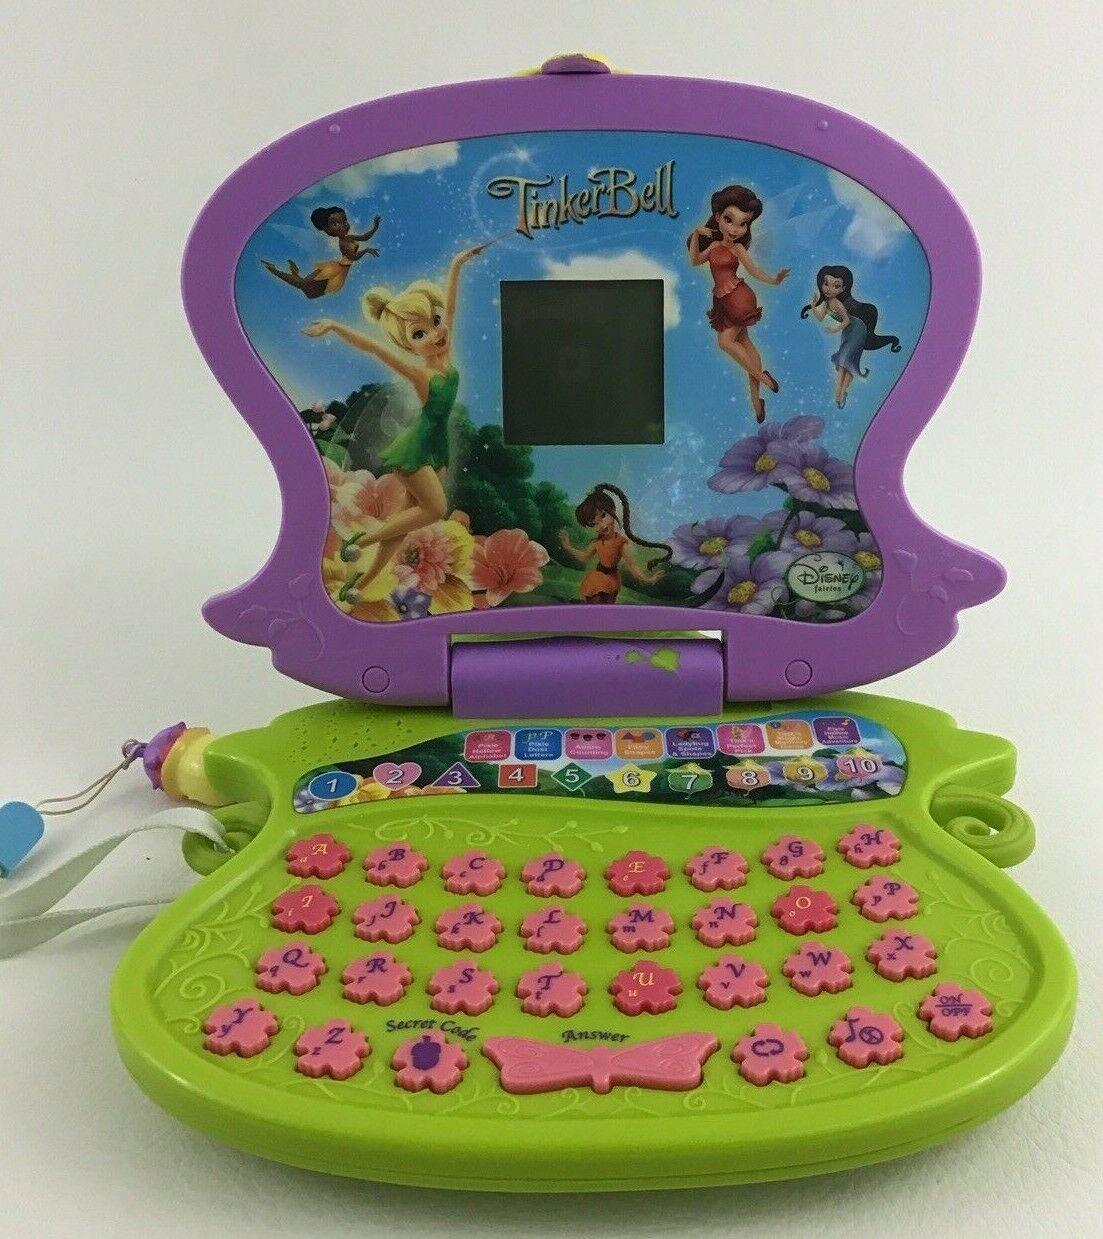 Disney Fairies Tinkerbell Laptop Computer Learning Pad Oregon Scientific Junior - $44.50